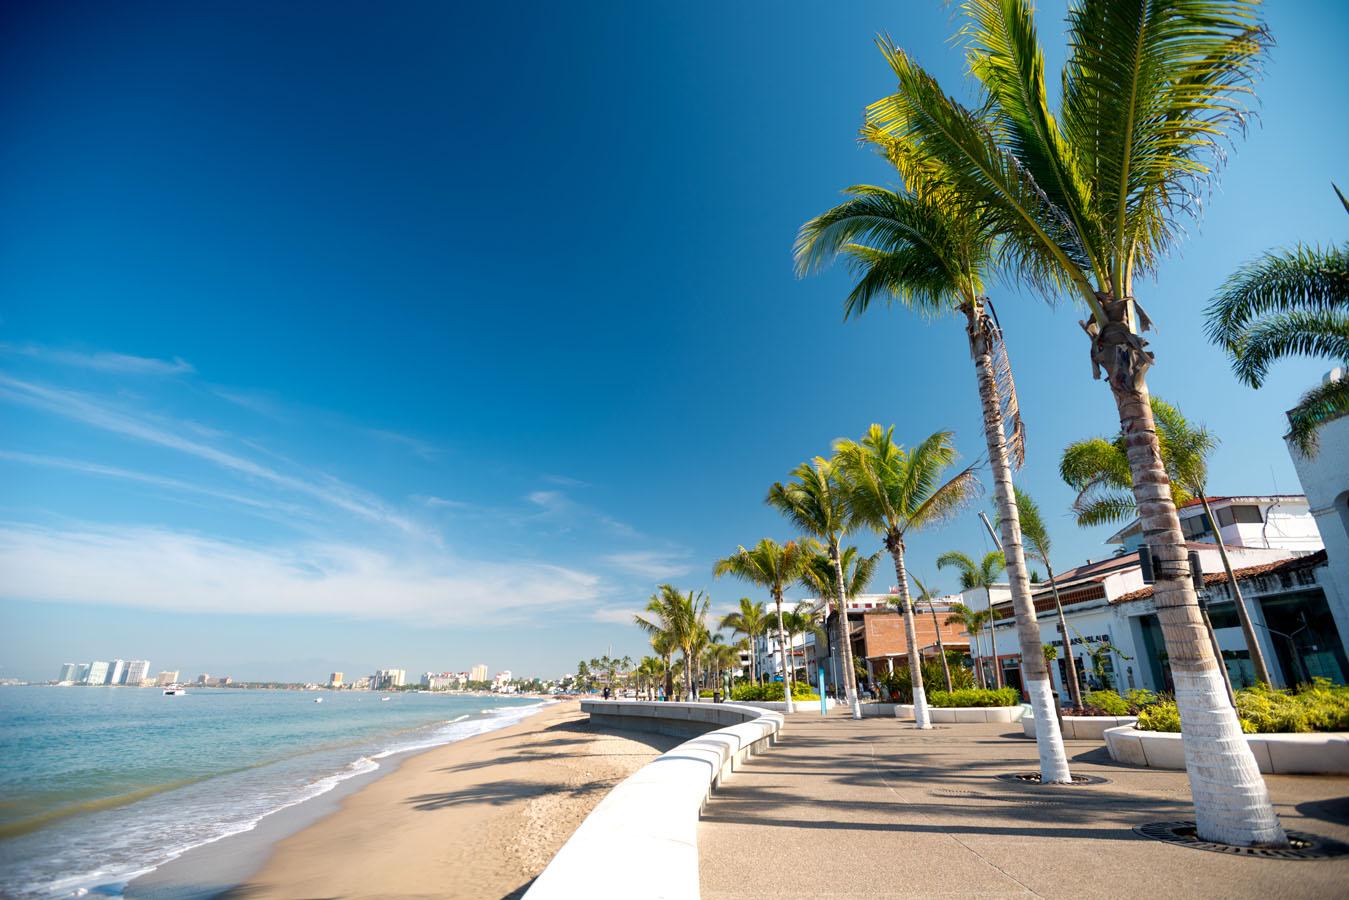 Actividades en Puerto Vallarta